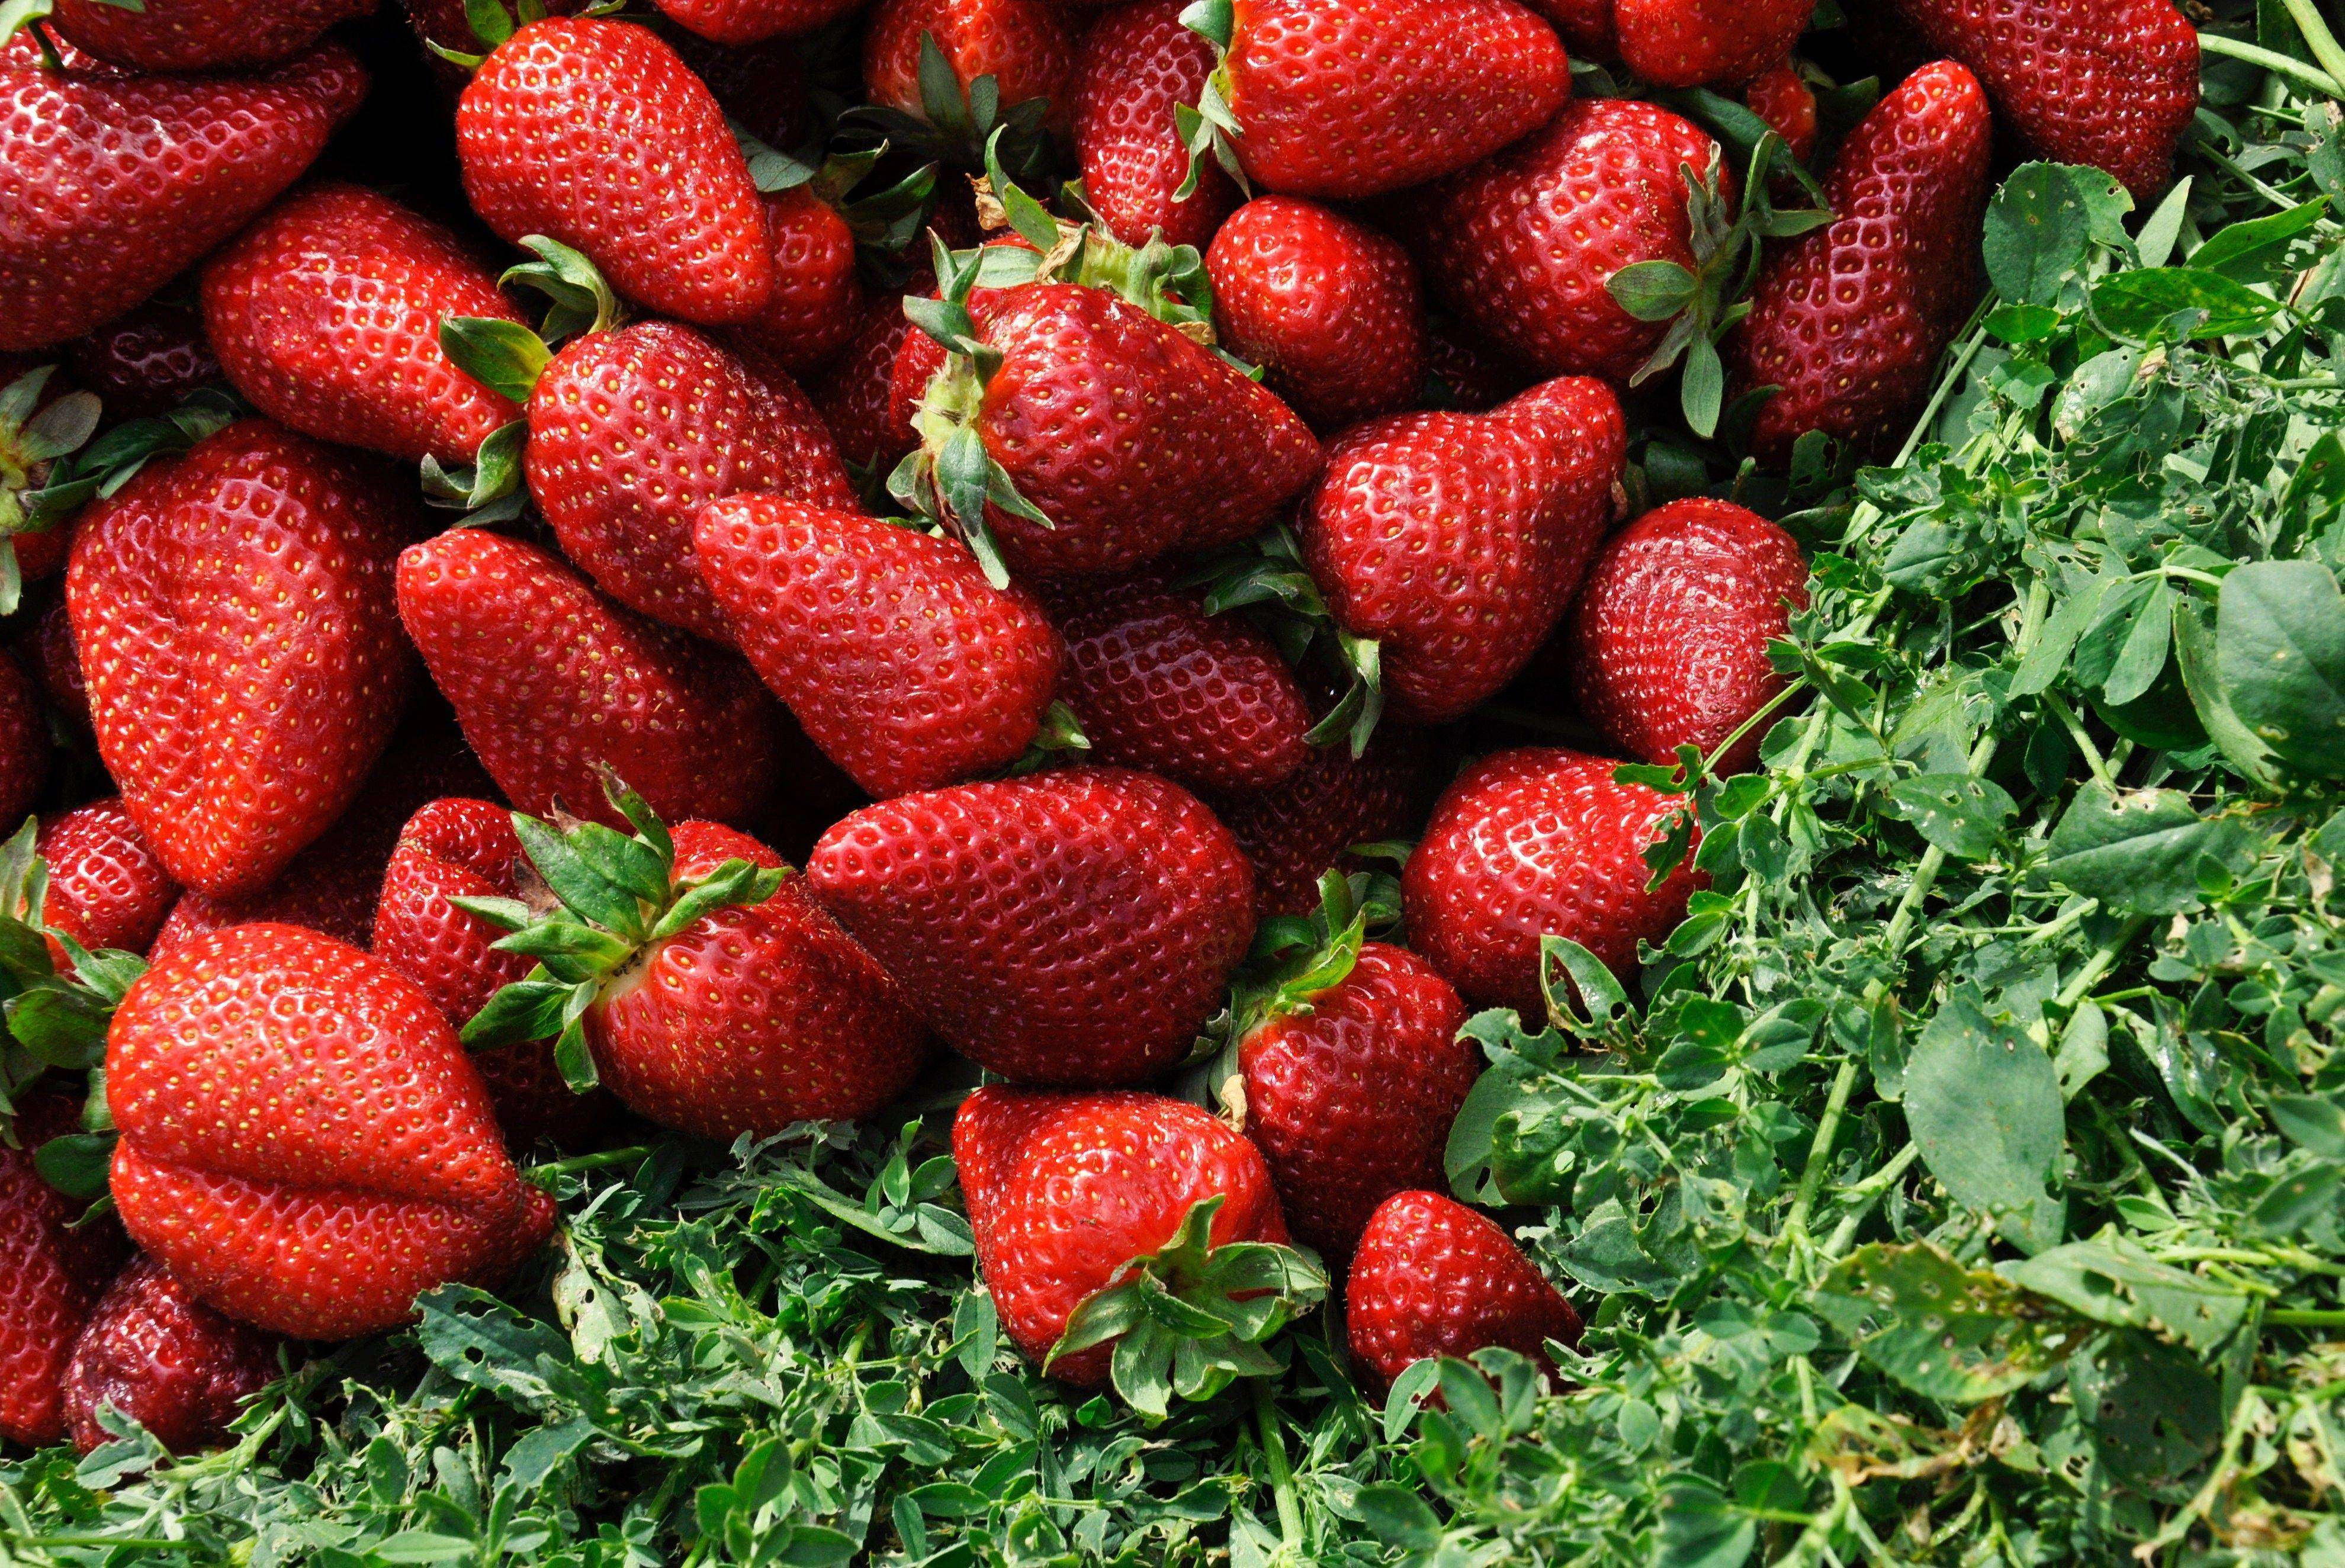 Strawberry Wallpaper 22 3960x2648